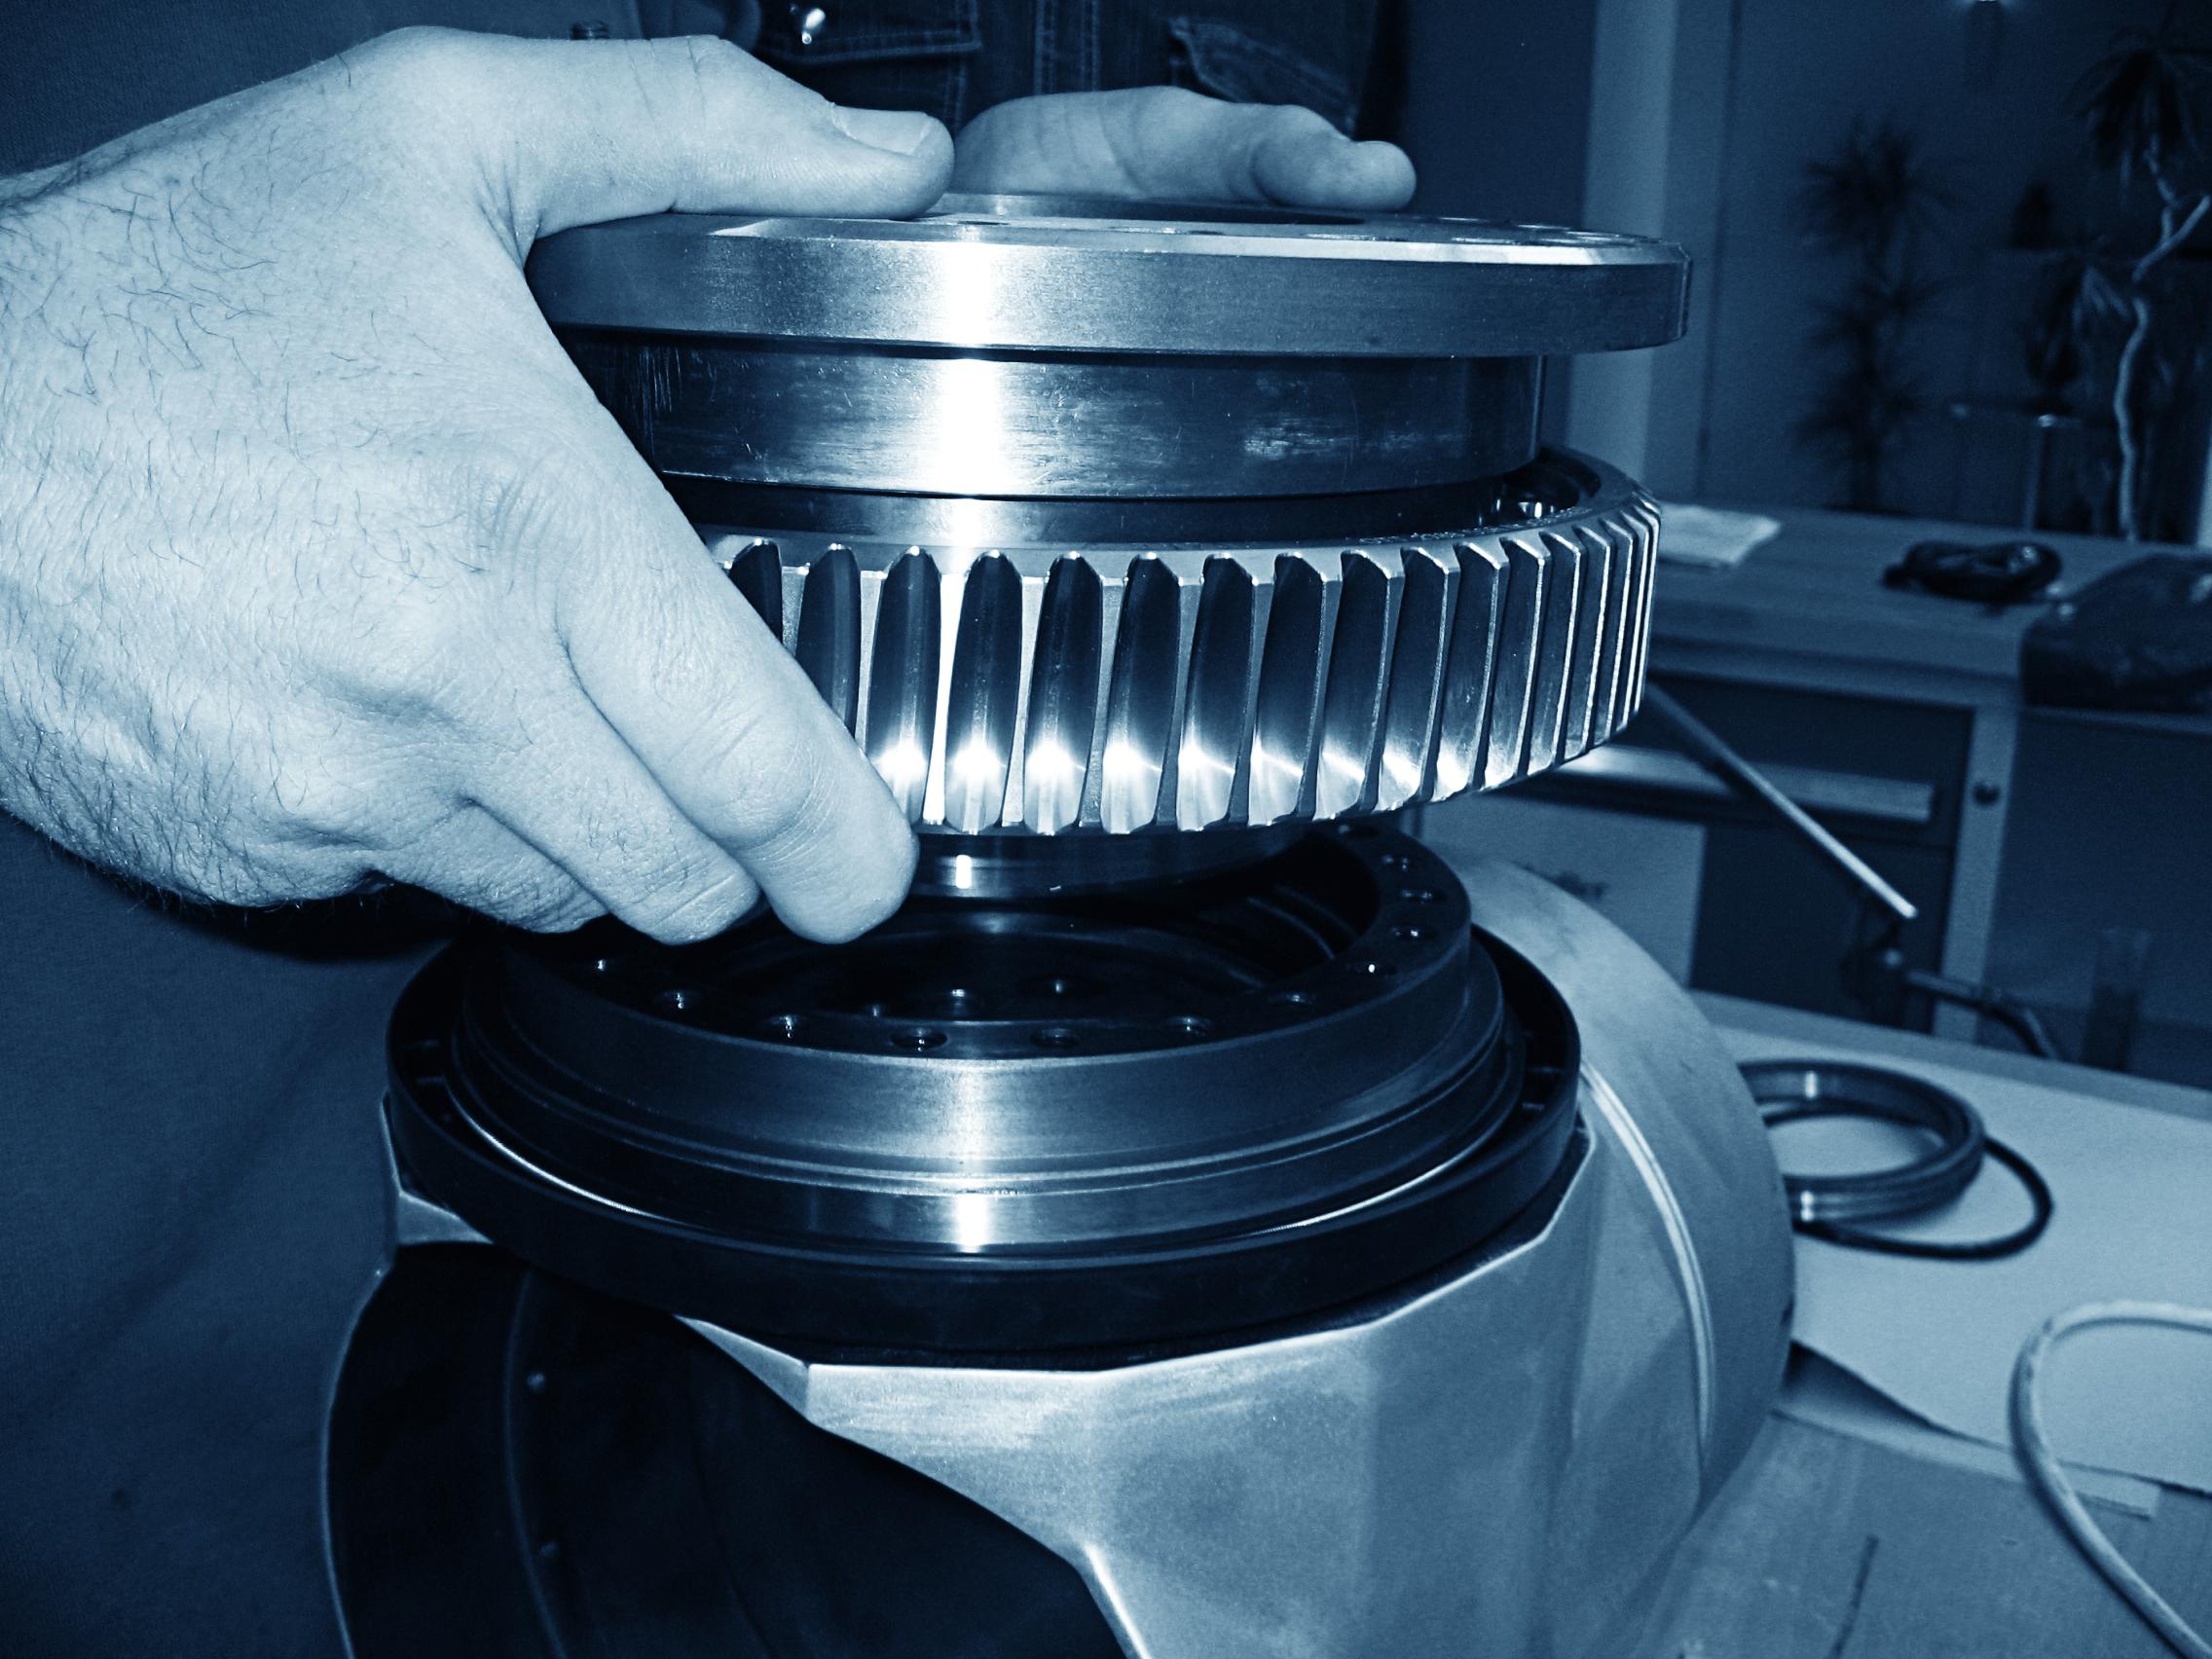 [:ru]Диагностика и ремонт станков с ЧПУ[:en]Diagnosis and repair of CNC machines